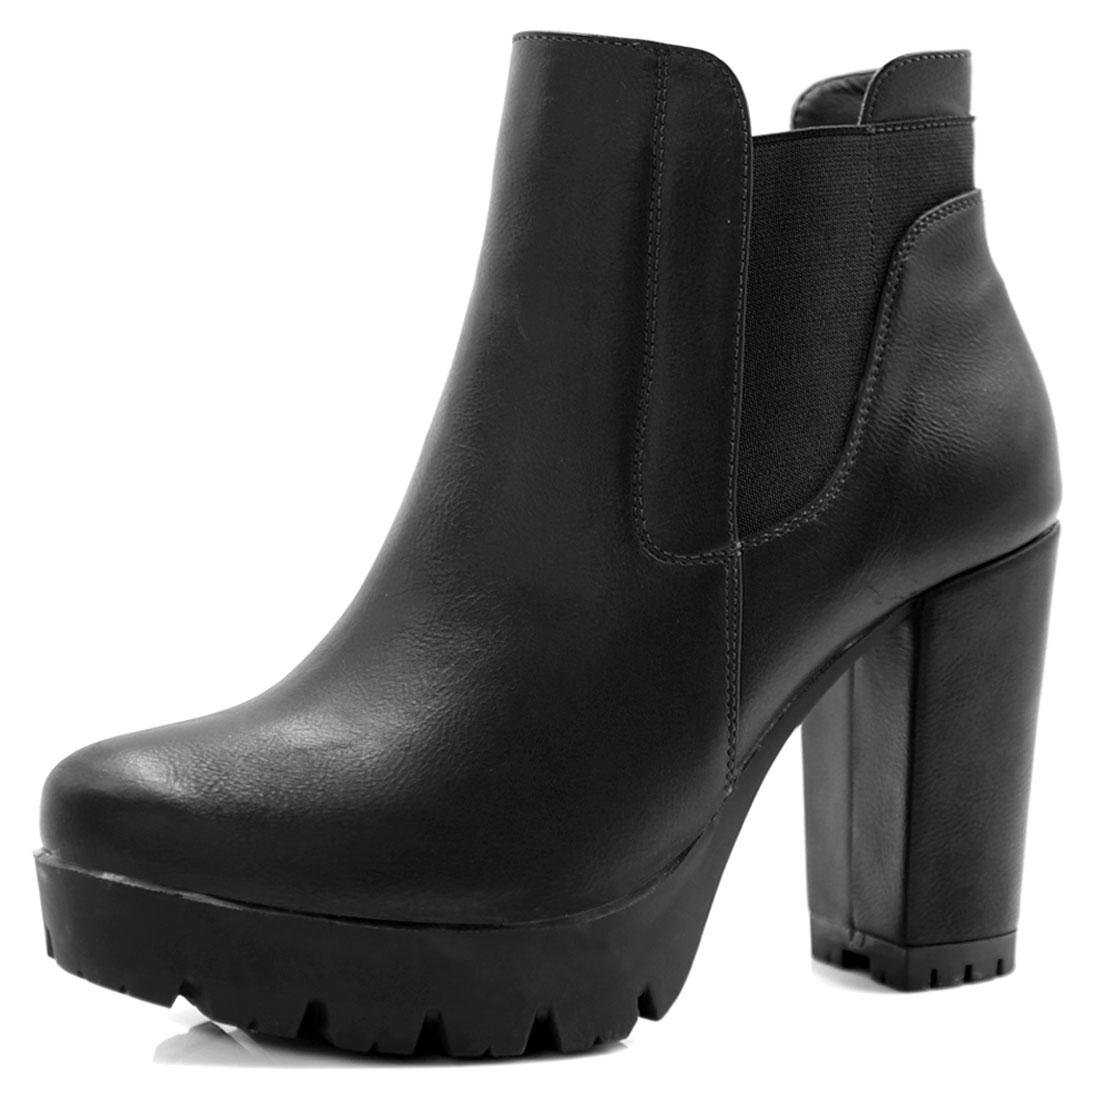 Women Chunky High Heel Platform Zipper Chelsea Boots Black US 7.5